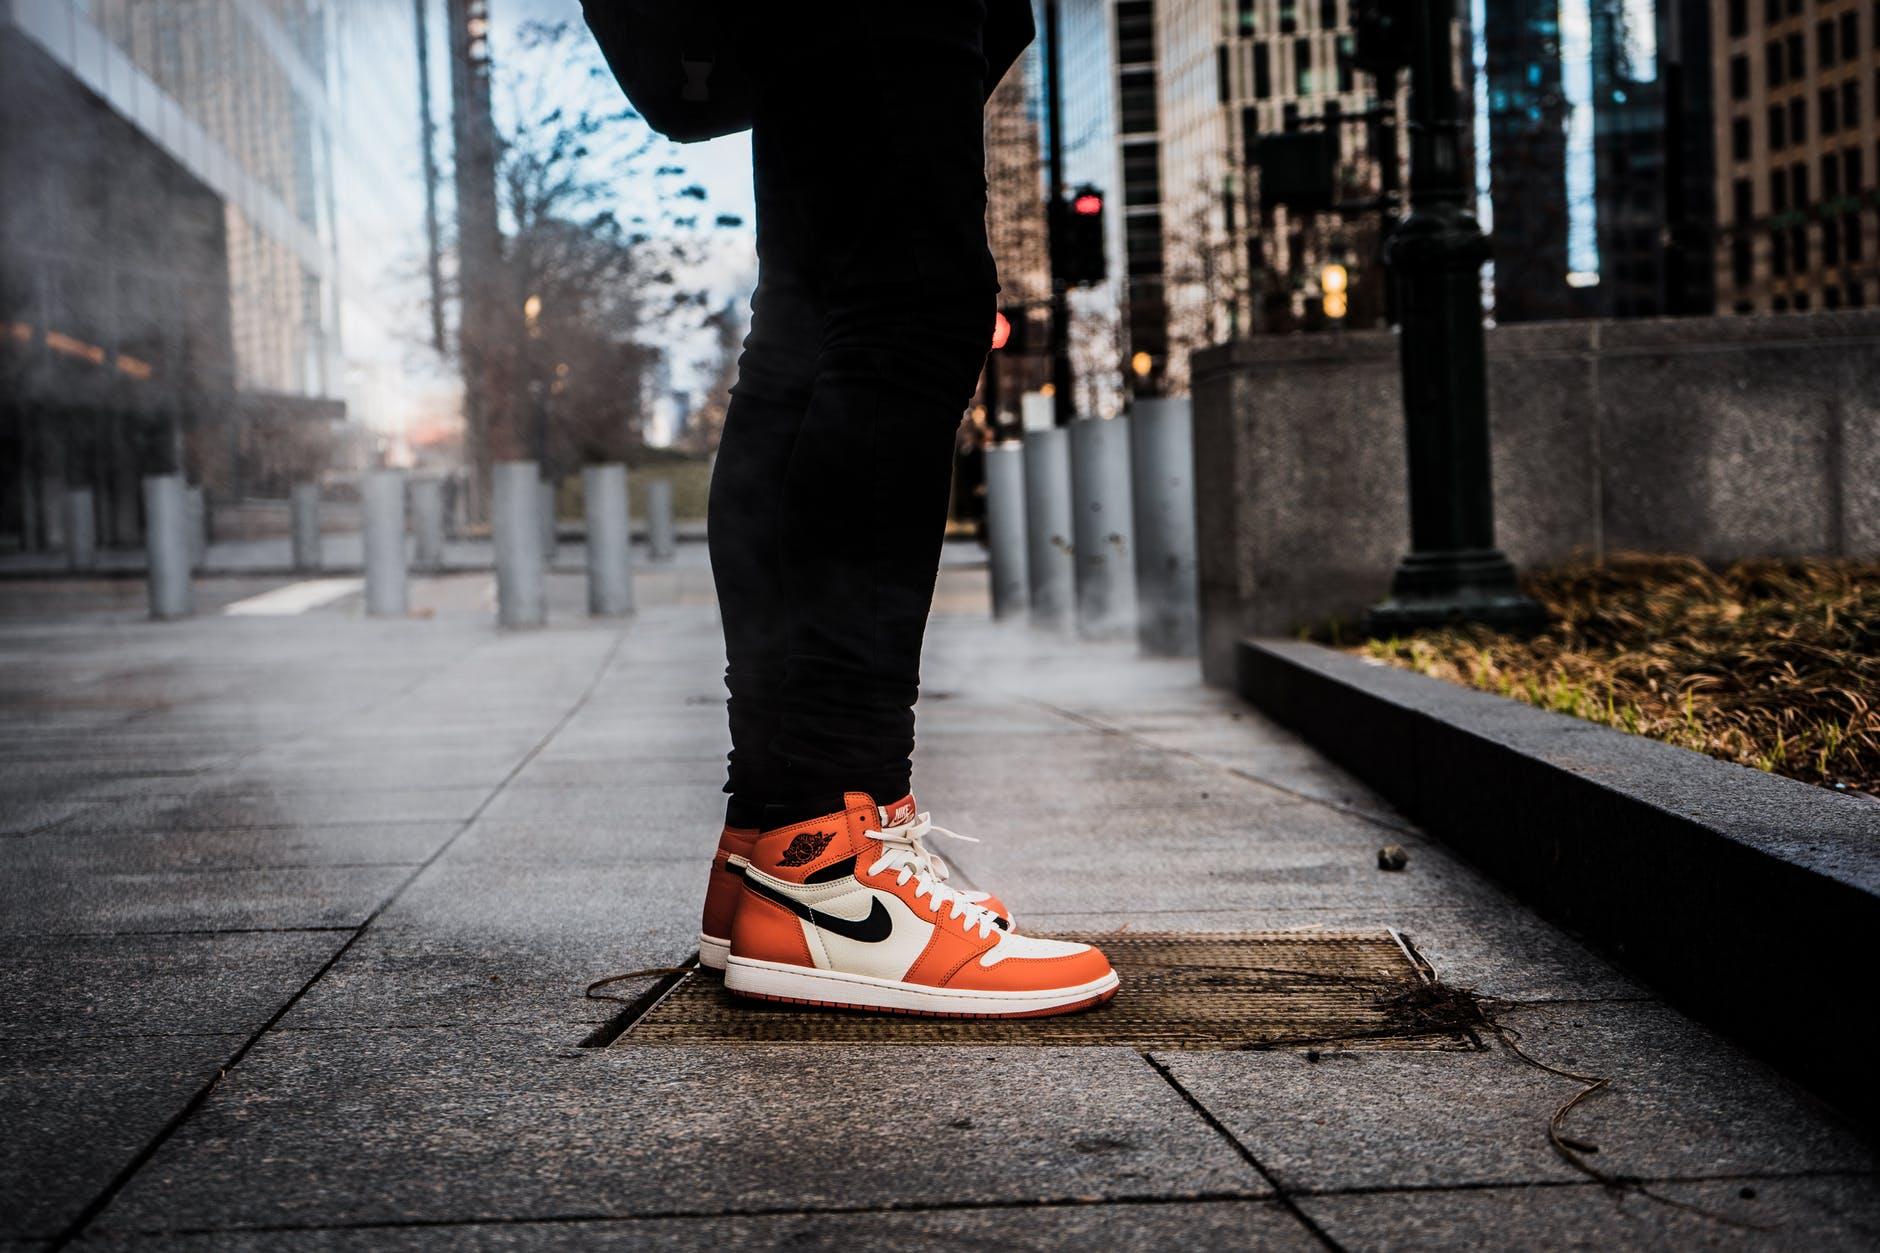 pair of white and orange nike sneakers